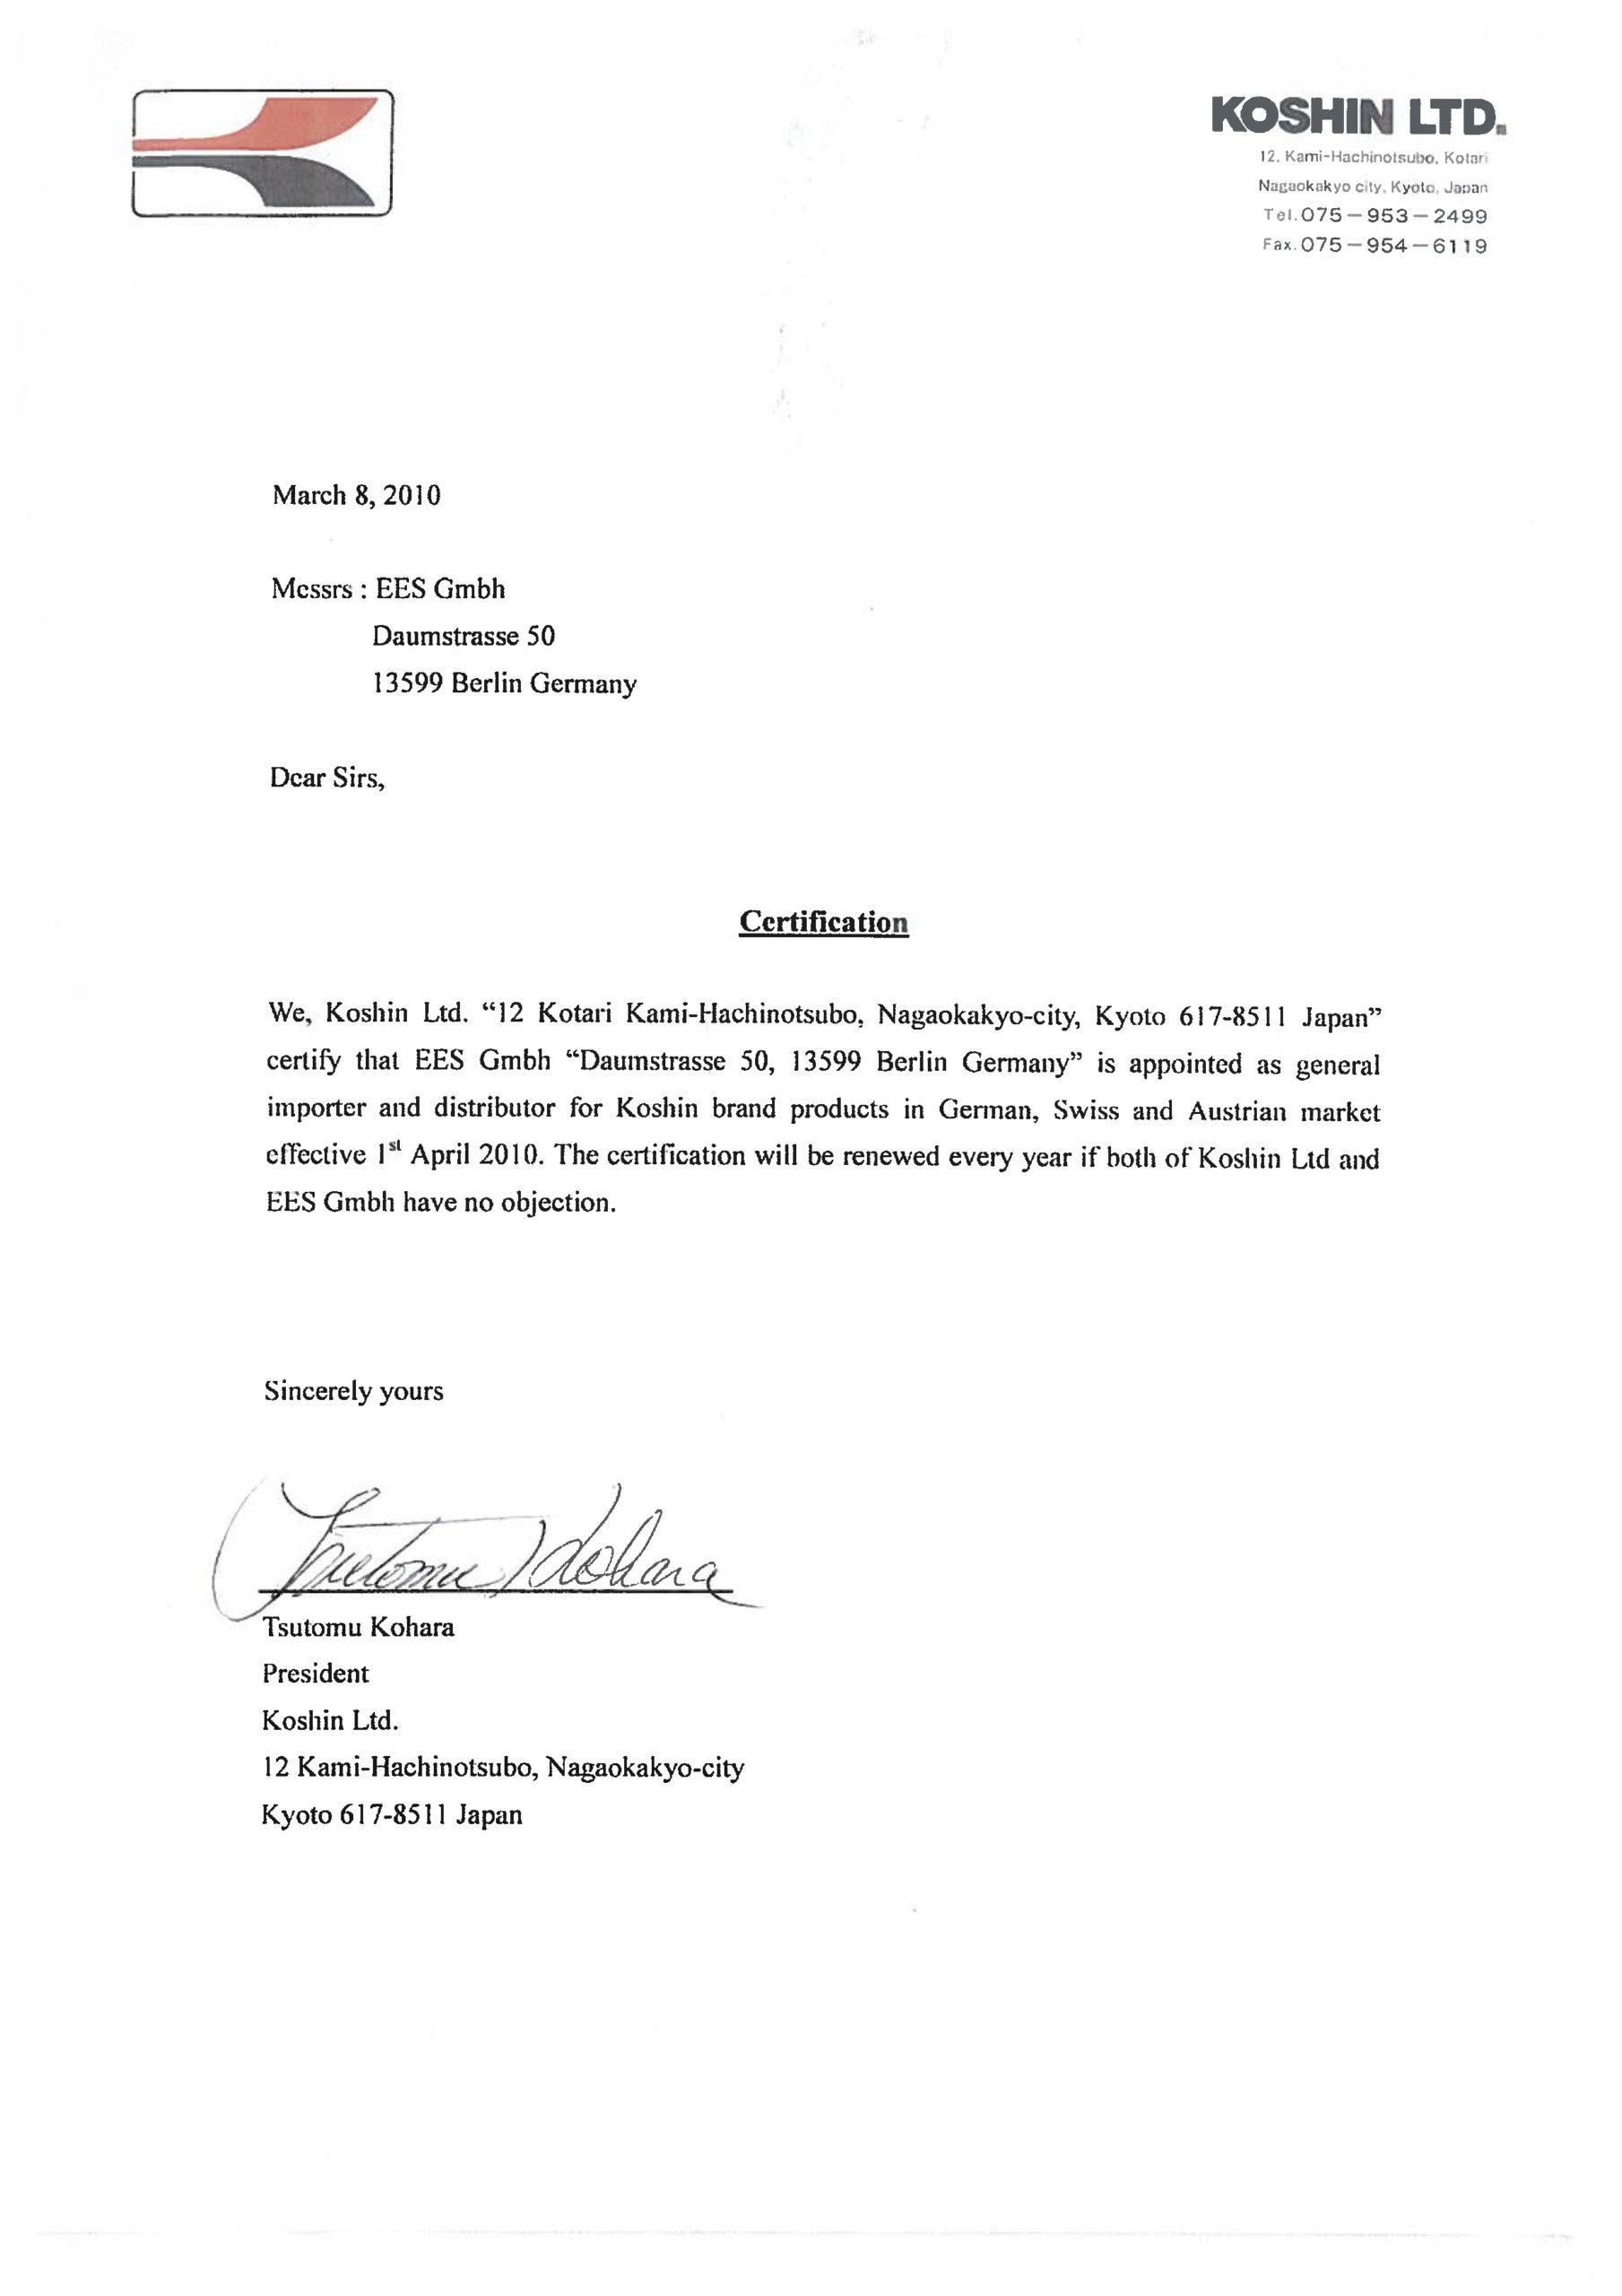 Koshin_Certificate_2010